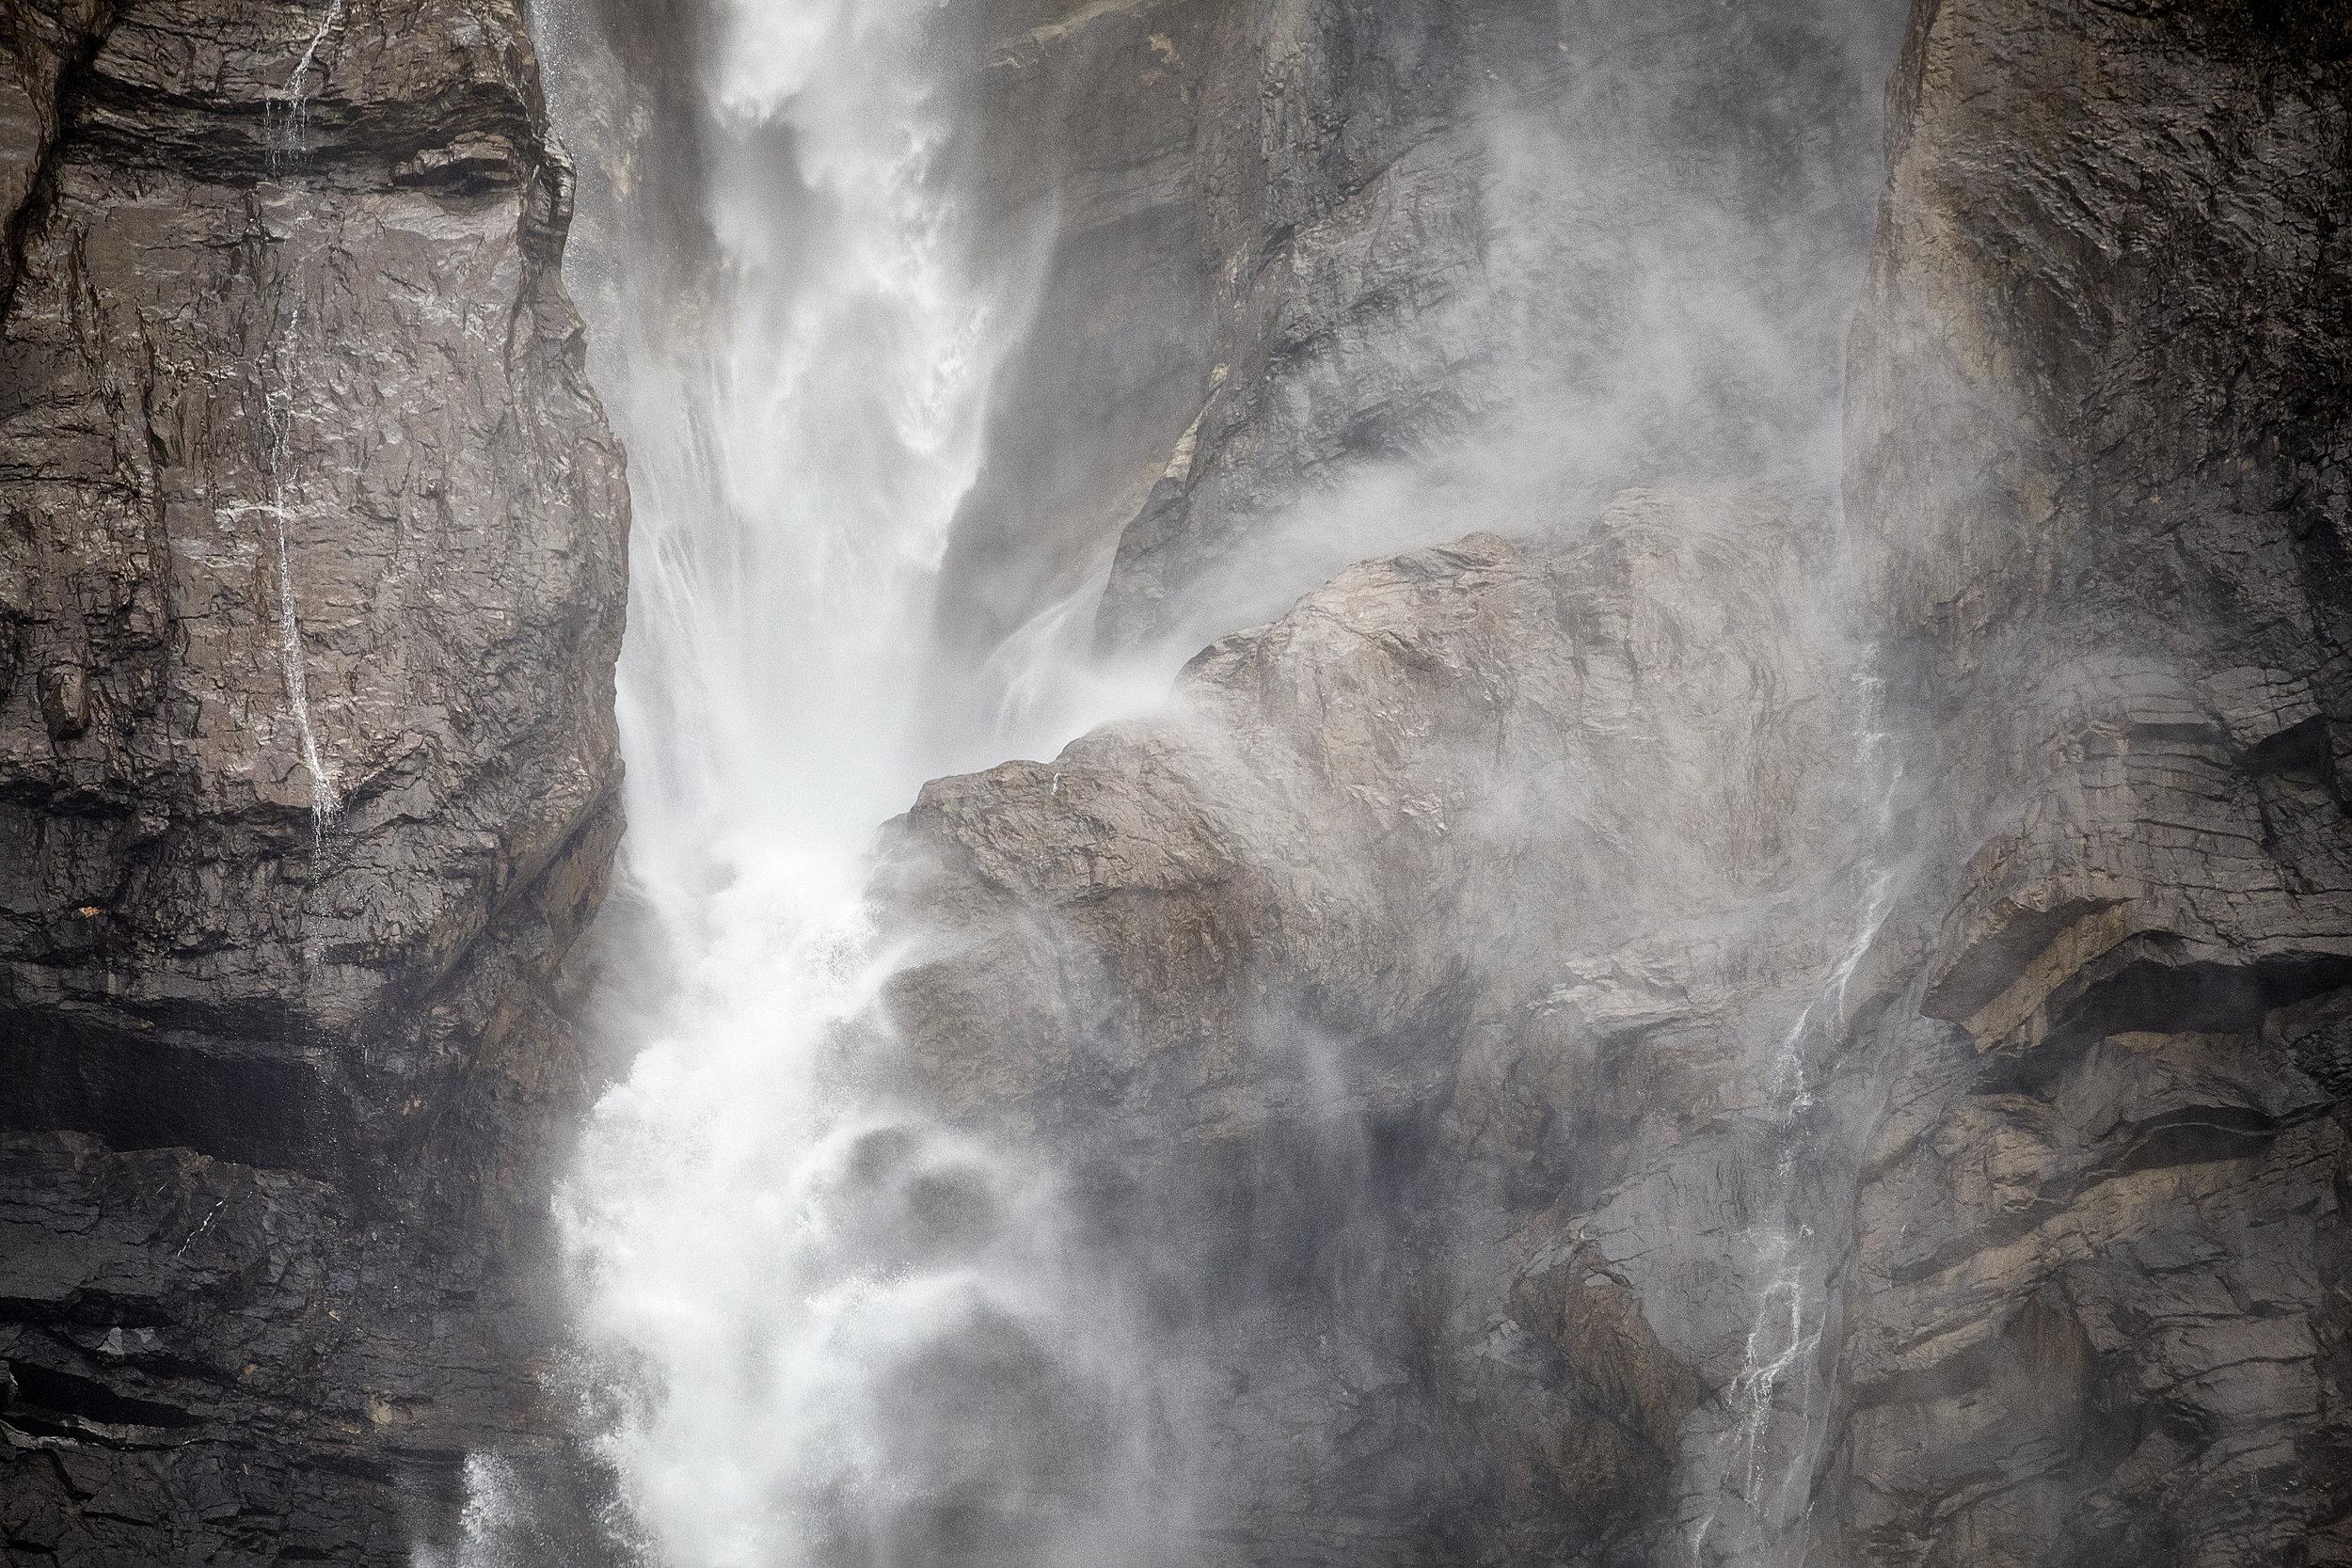 WaterFallDetail82.jpg